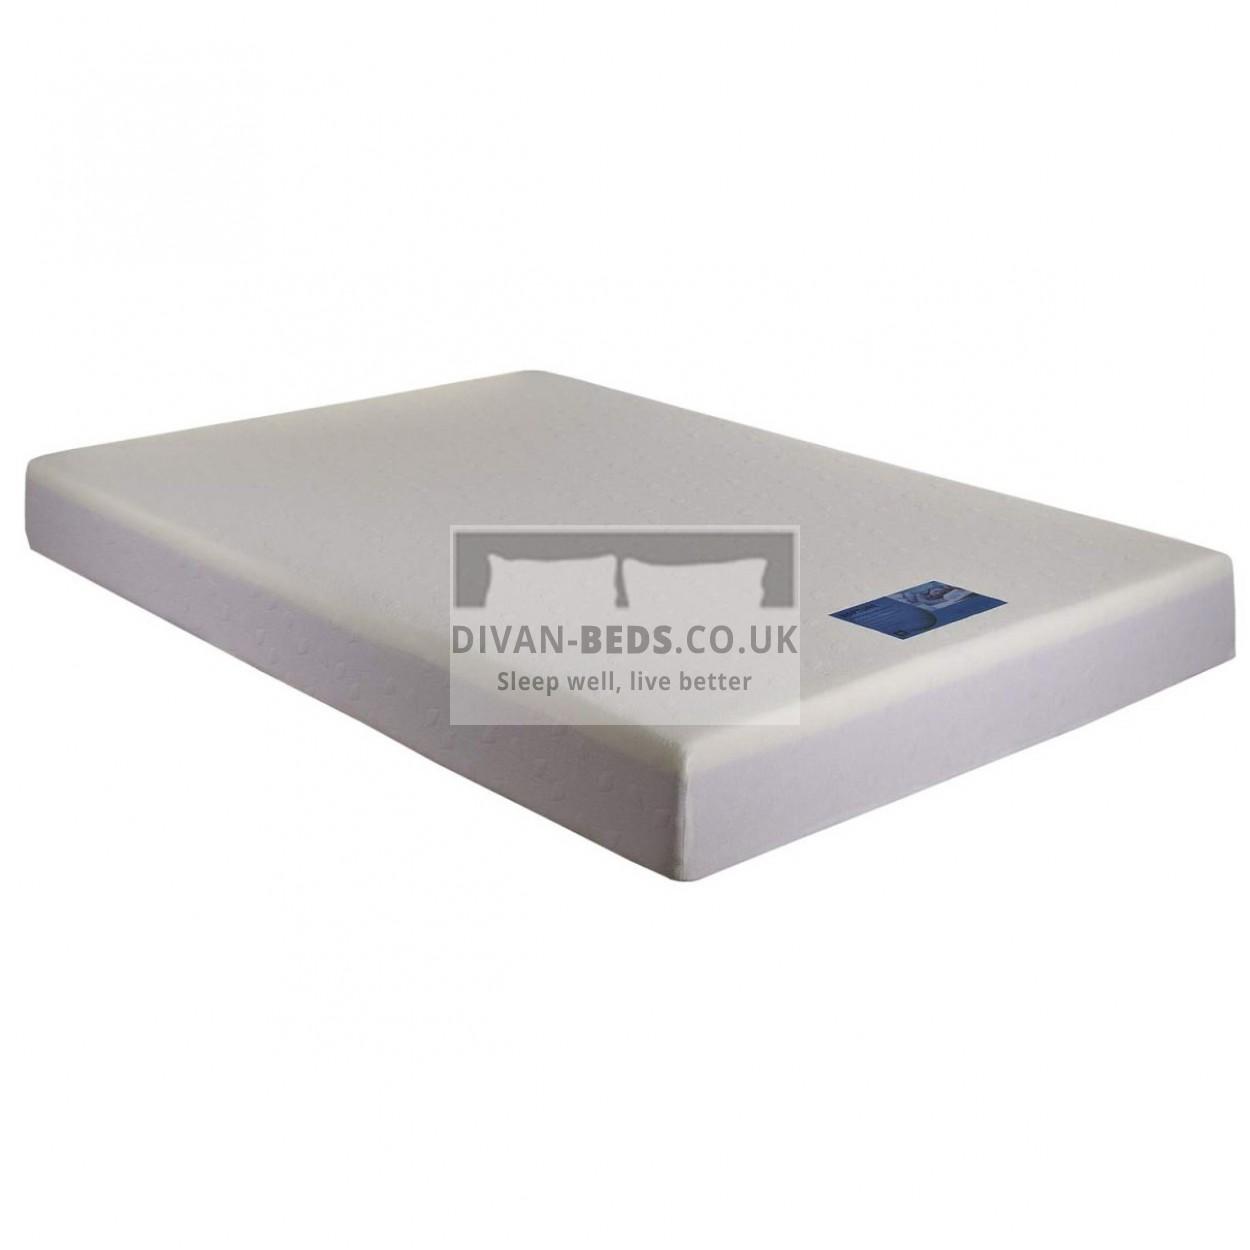 Full Memory Foam Mattress Guaranteed Cheapest Free